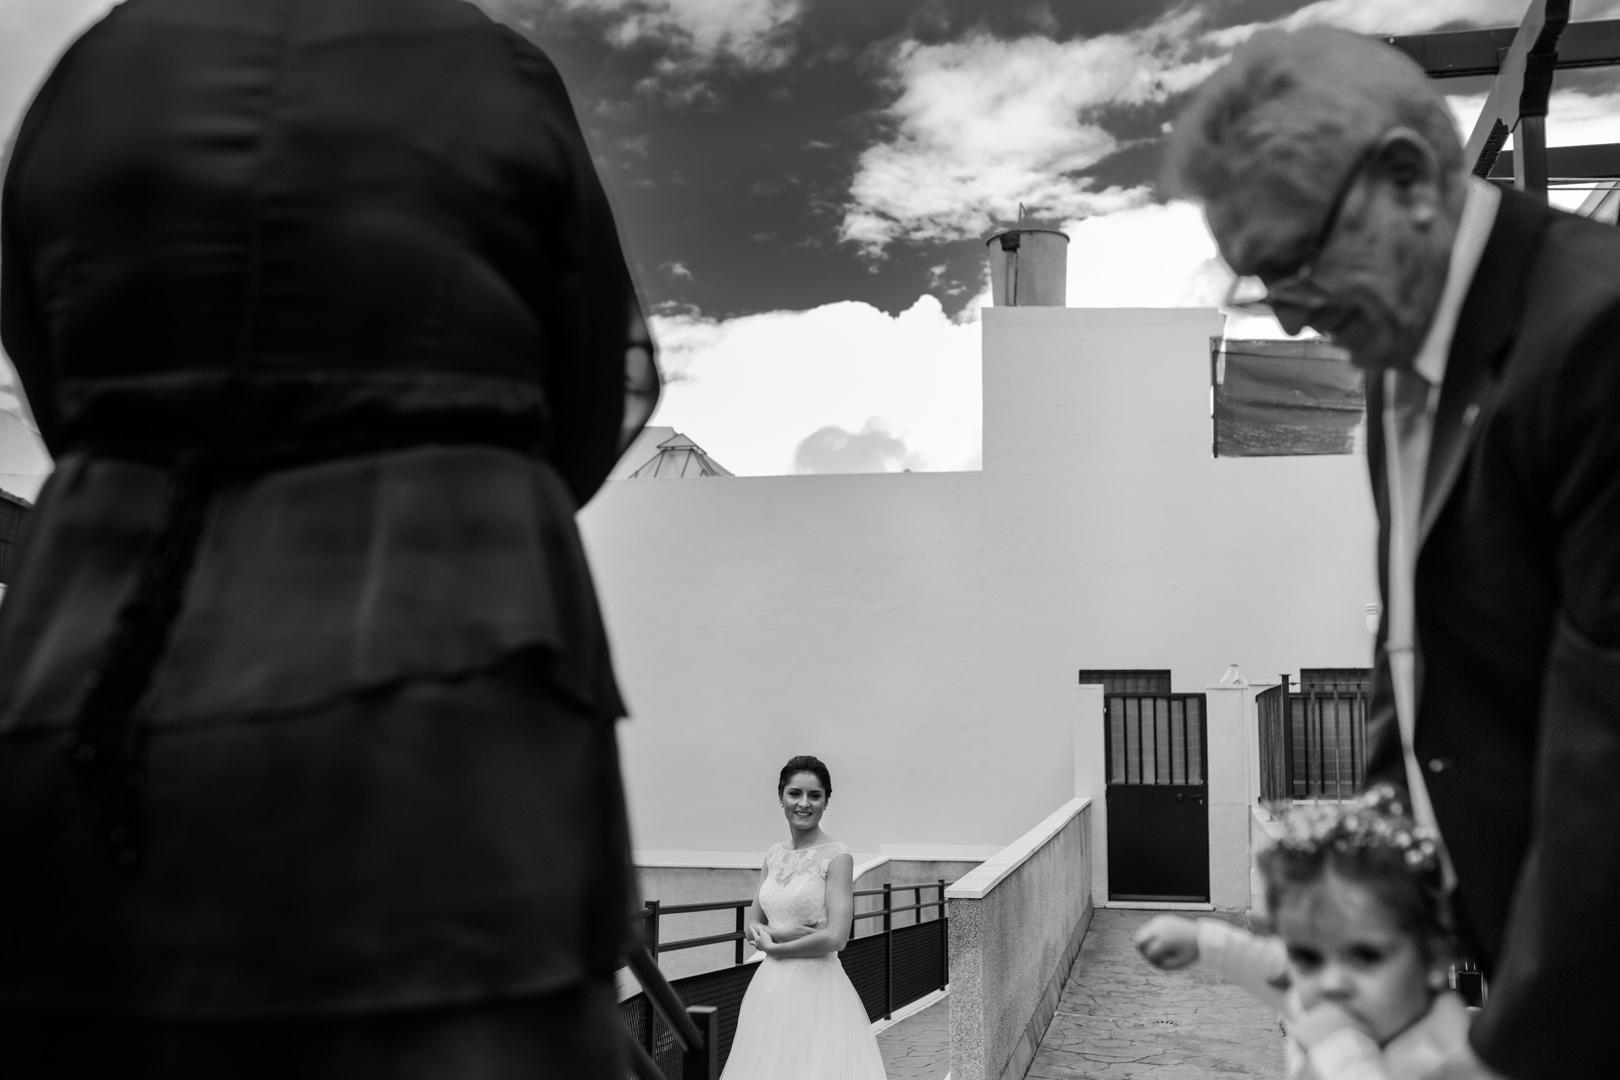 Boda-Hacienda-LOrigen-Pepe-Maria-engagement-Rafael-Torres-fotografo-bodas-sevilla-madrid-barcelona-wedding-photographer--15.jpg